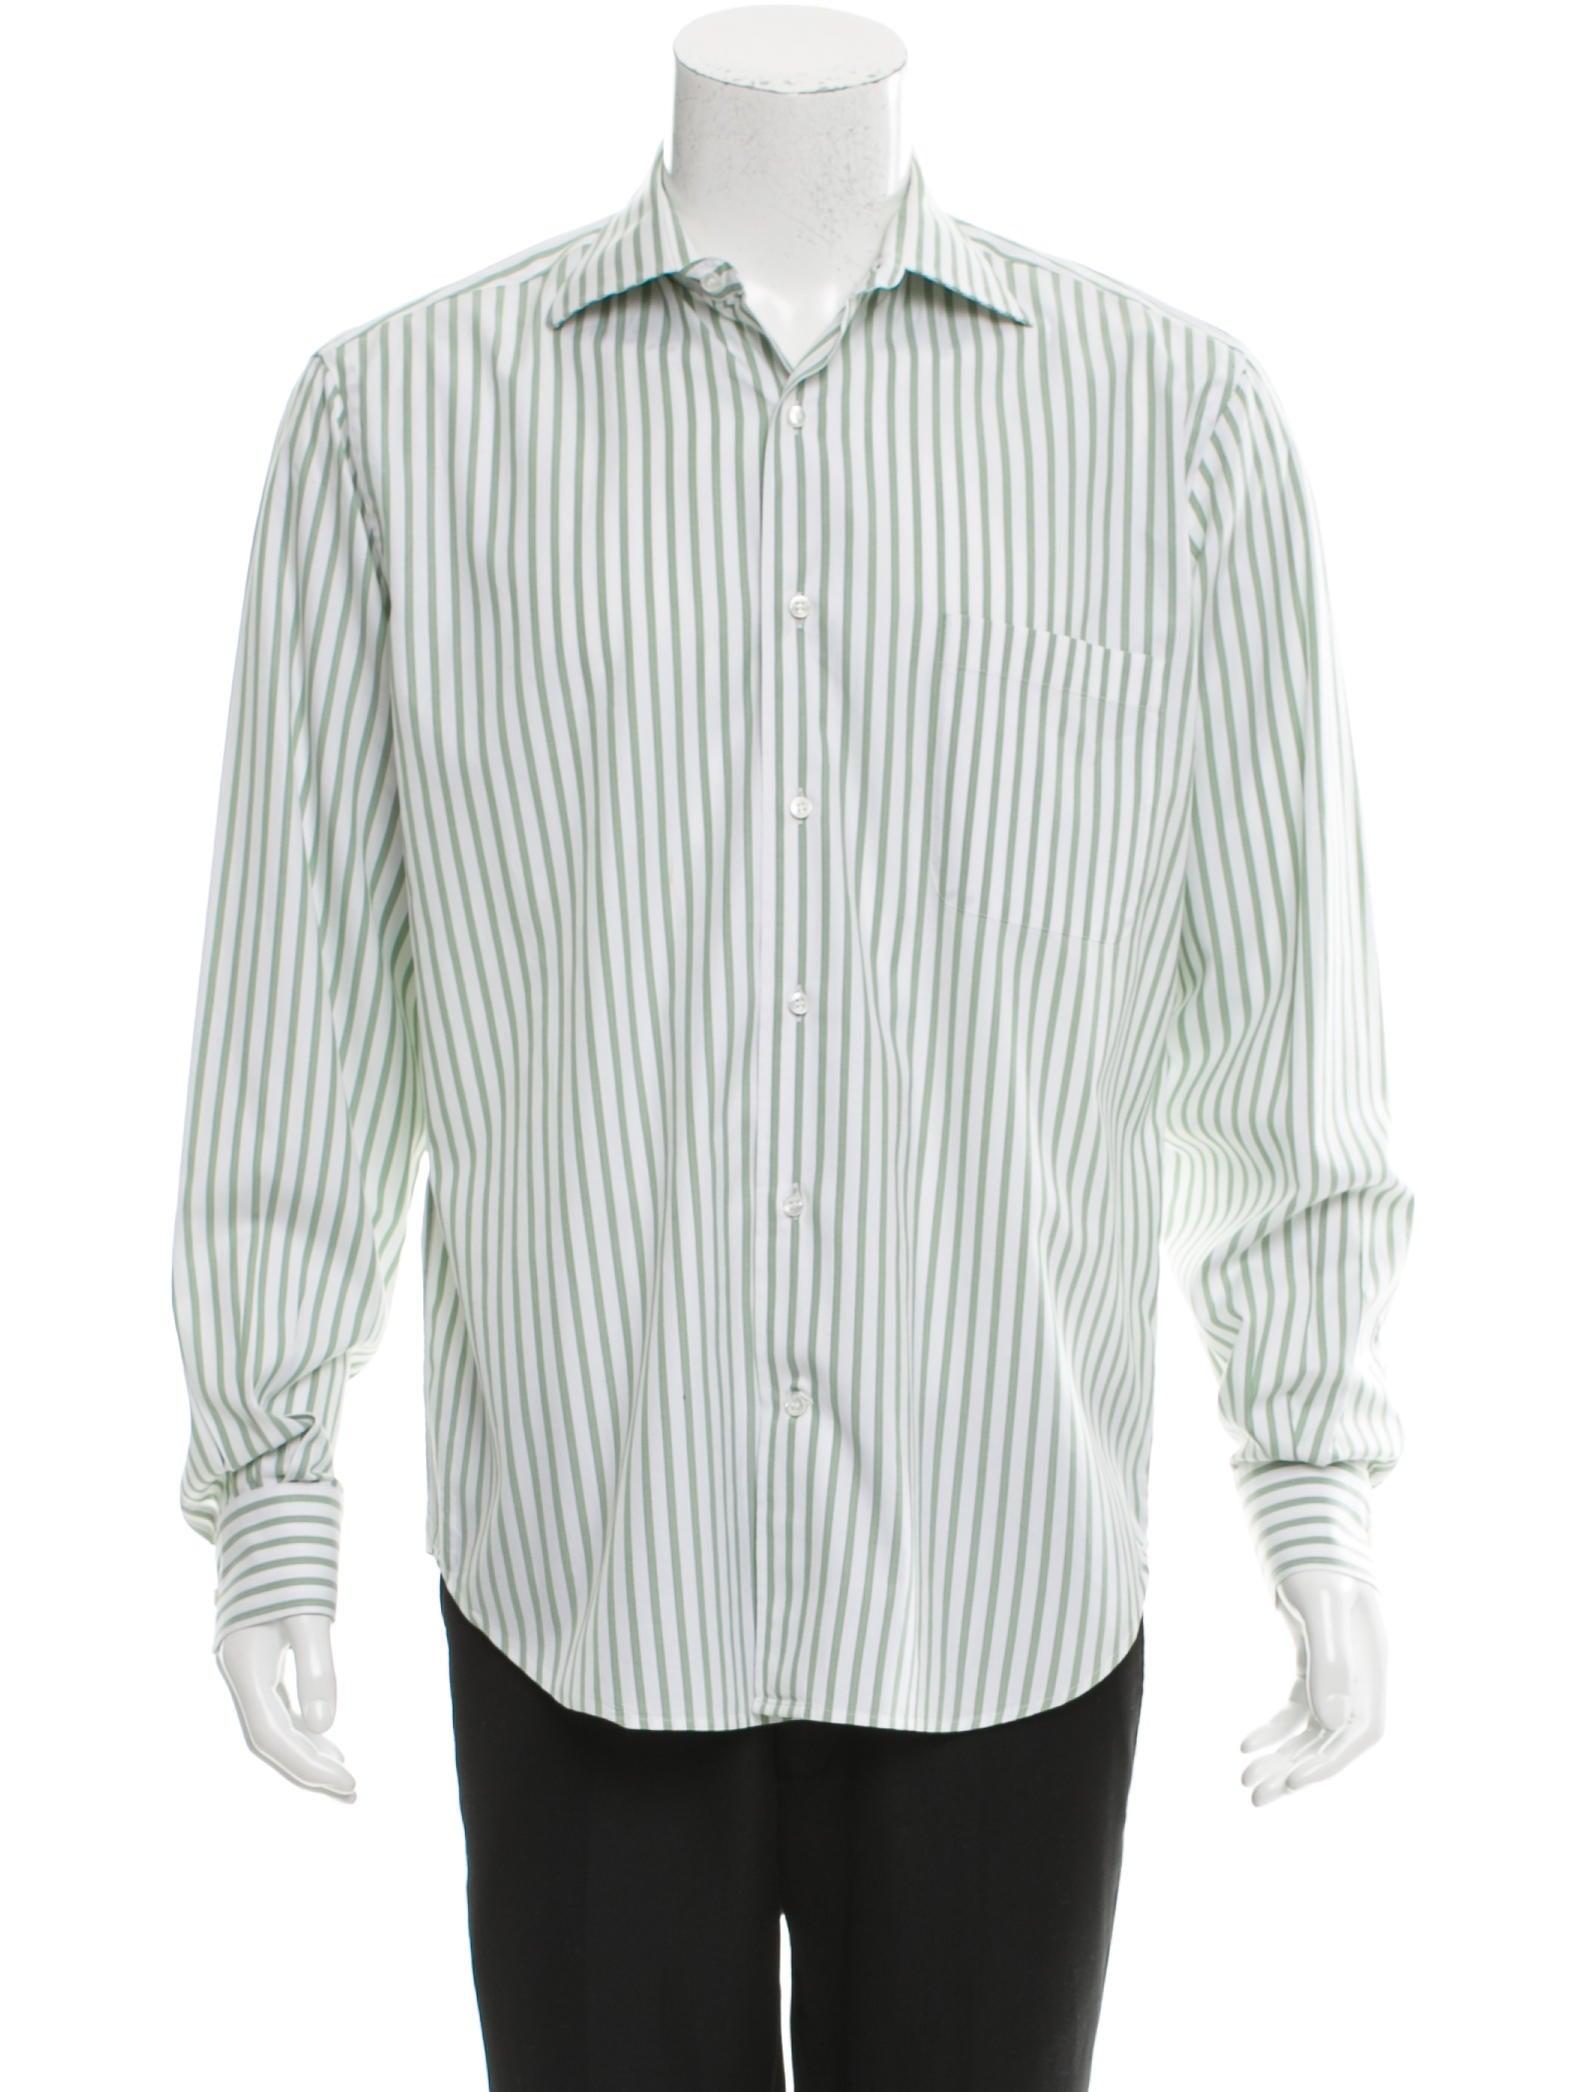 Loro piana striped button up shirt clothing lor34440 for Striped button up shirt mens